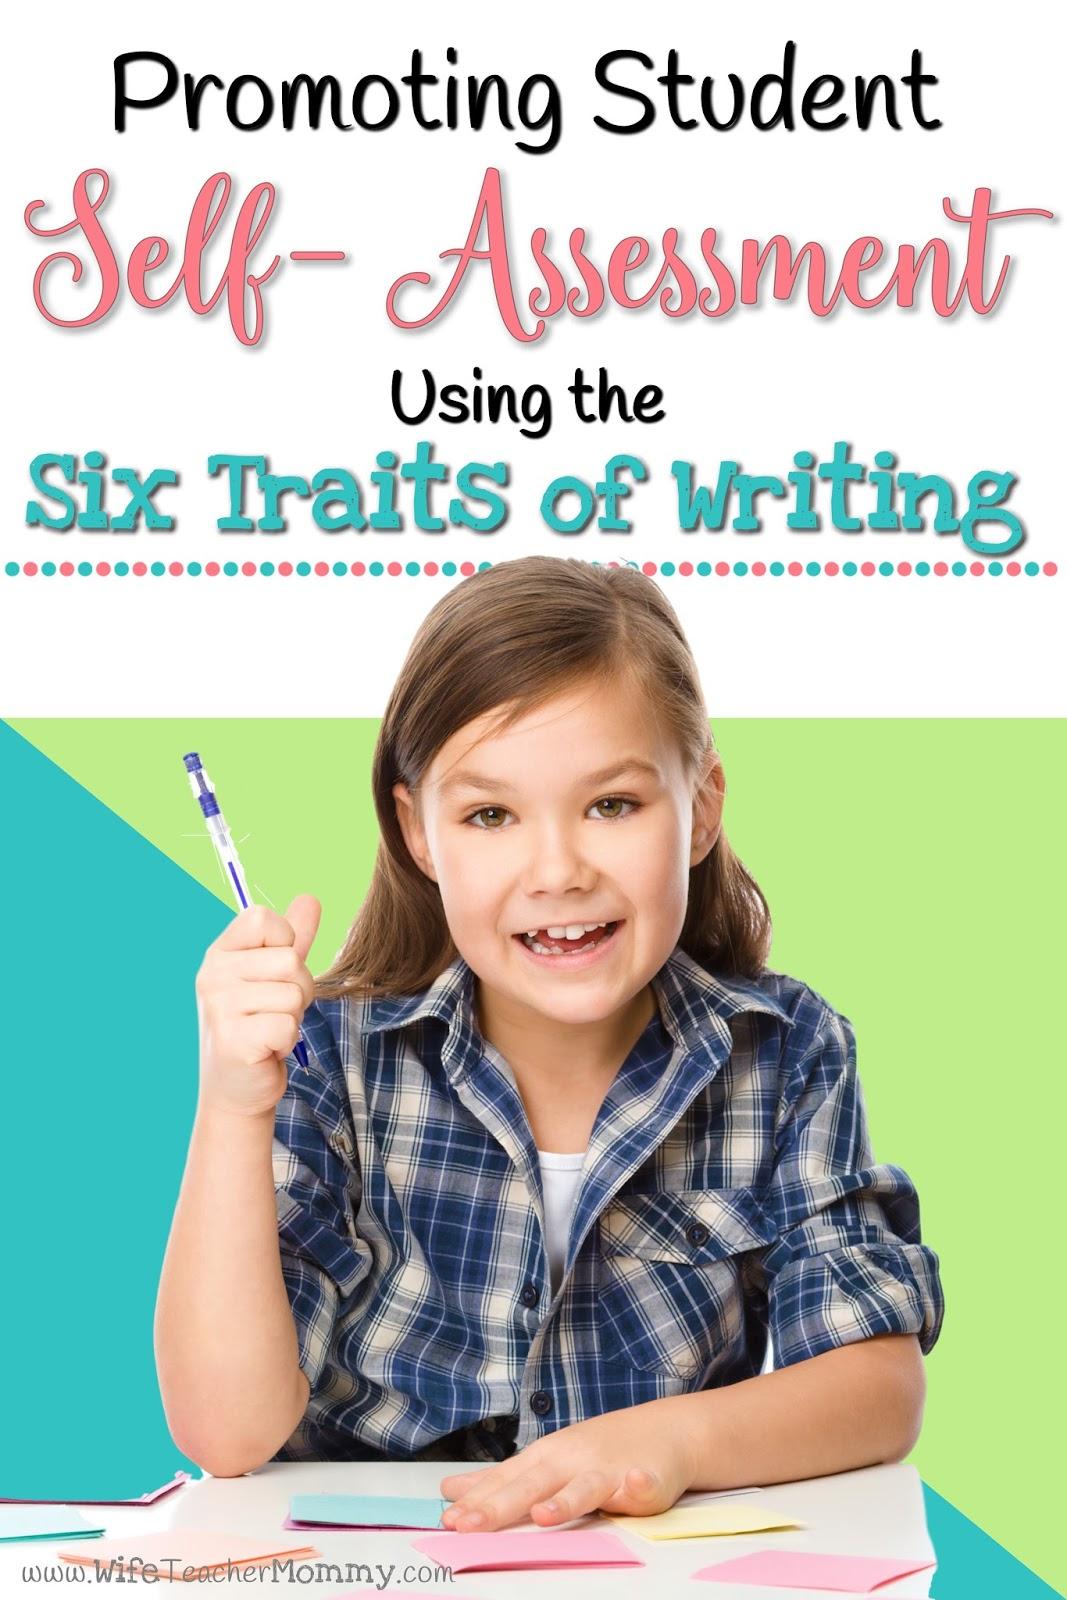 Traits of Writing     Ideas   Bulletin board  School and Classroom fun     best rubrics images on Pinterest   Rubrics  Teaching ideas and Essay  writing